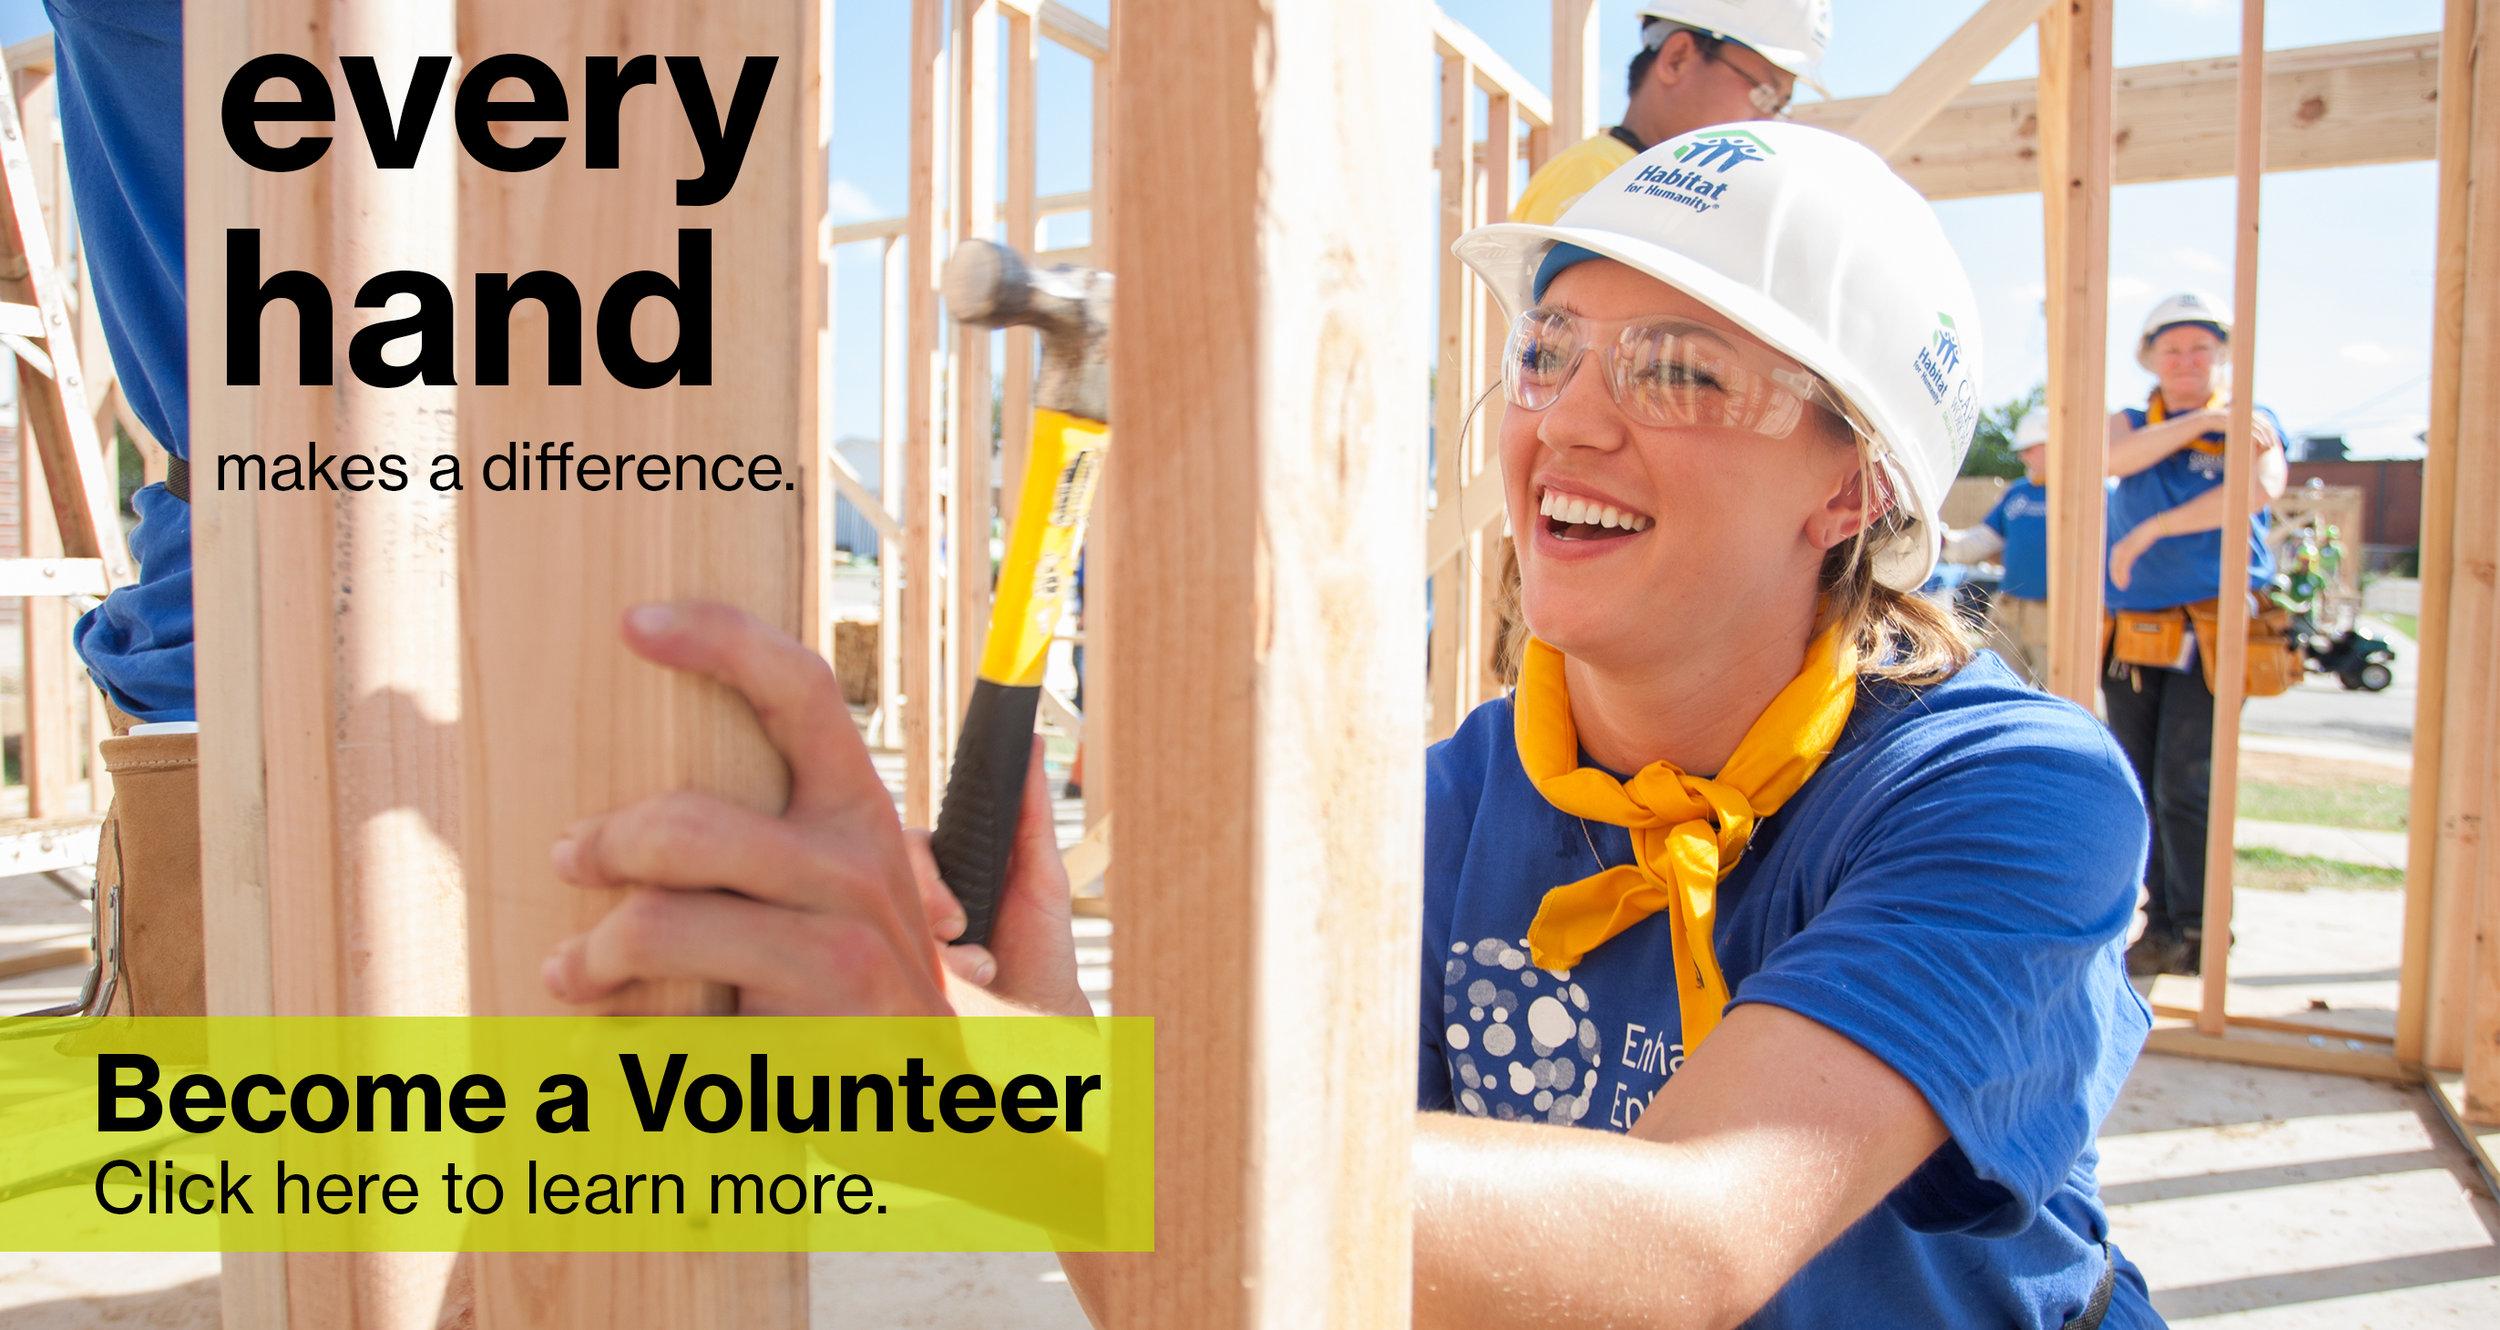 Volunteer at Habitat for Humanity